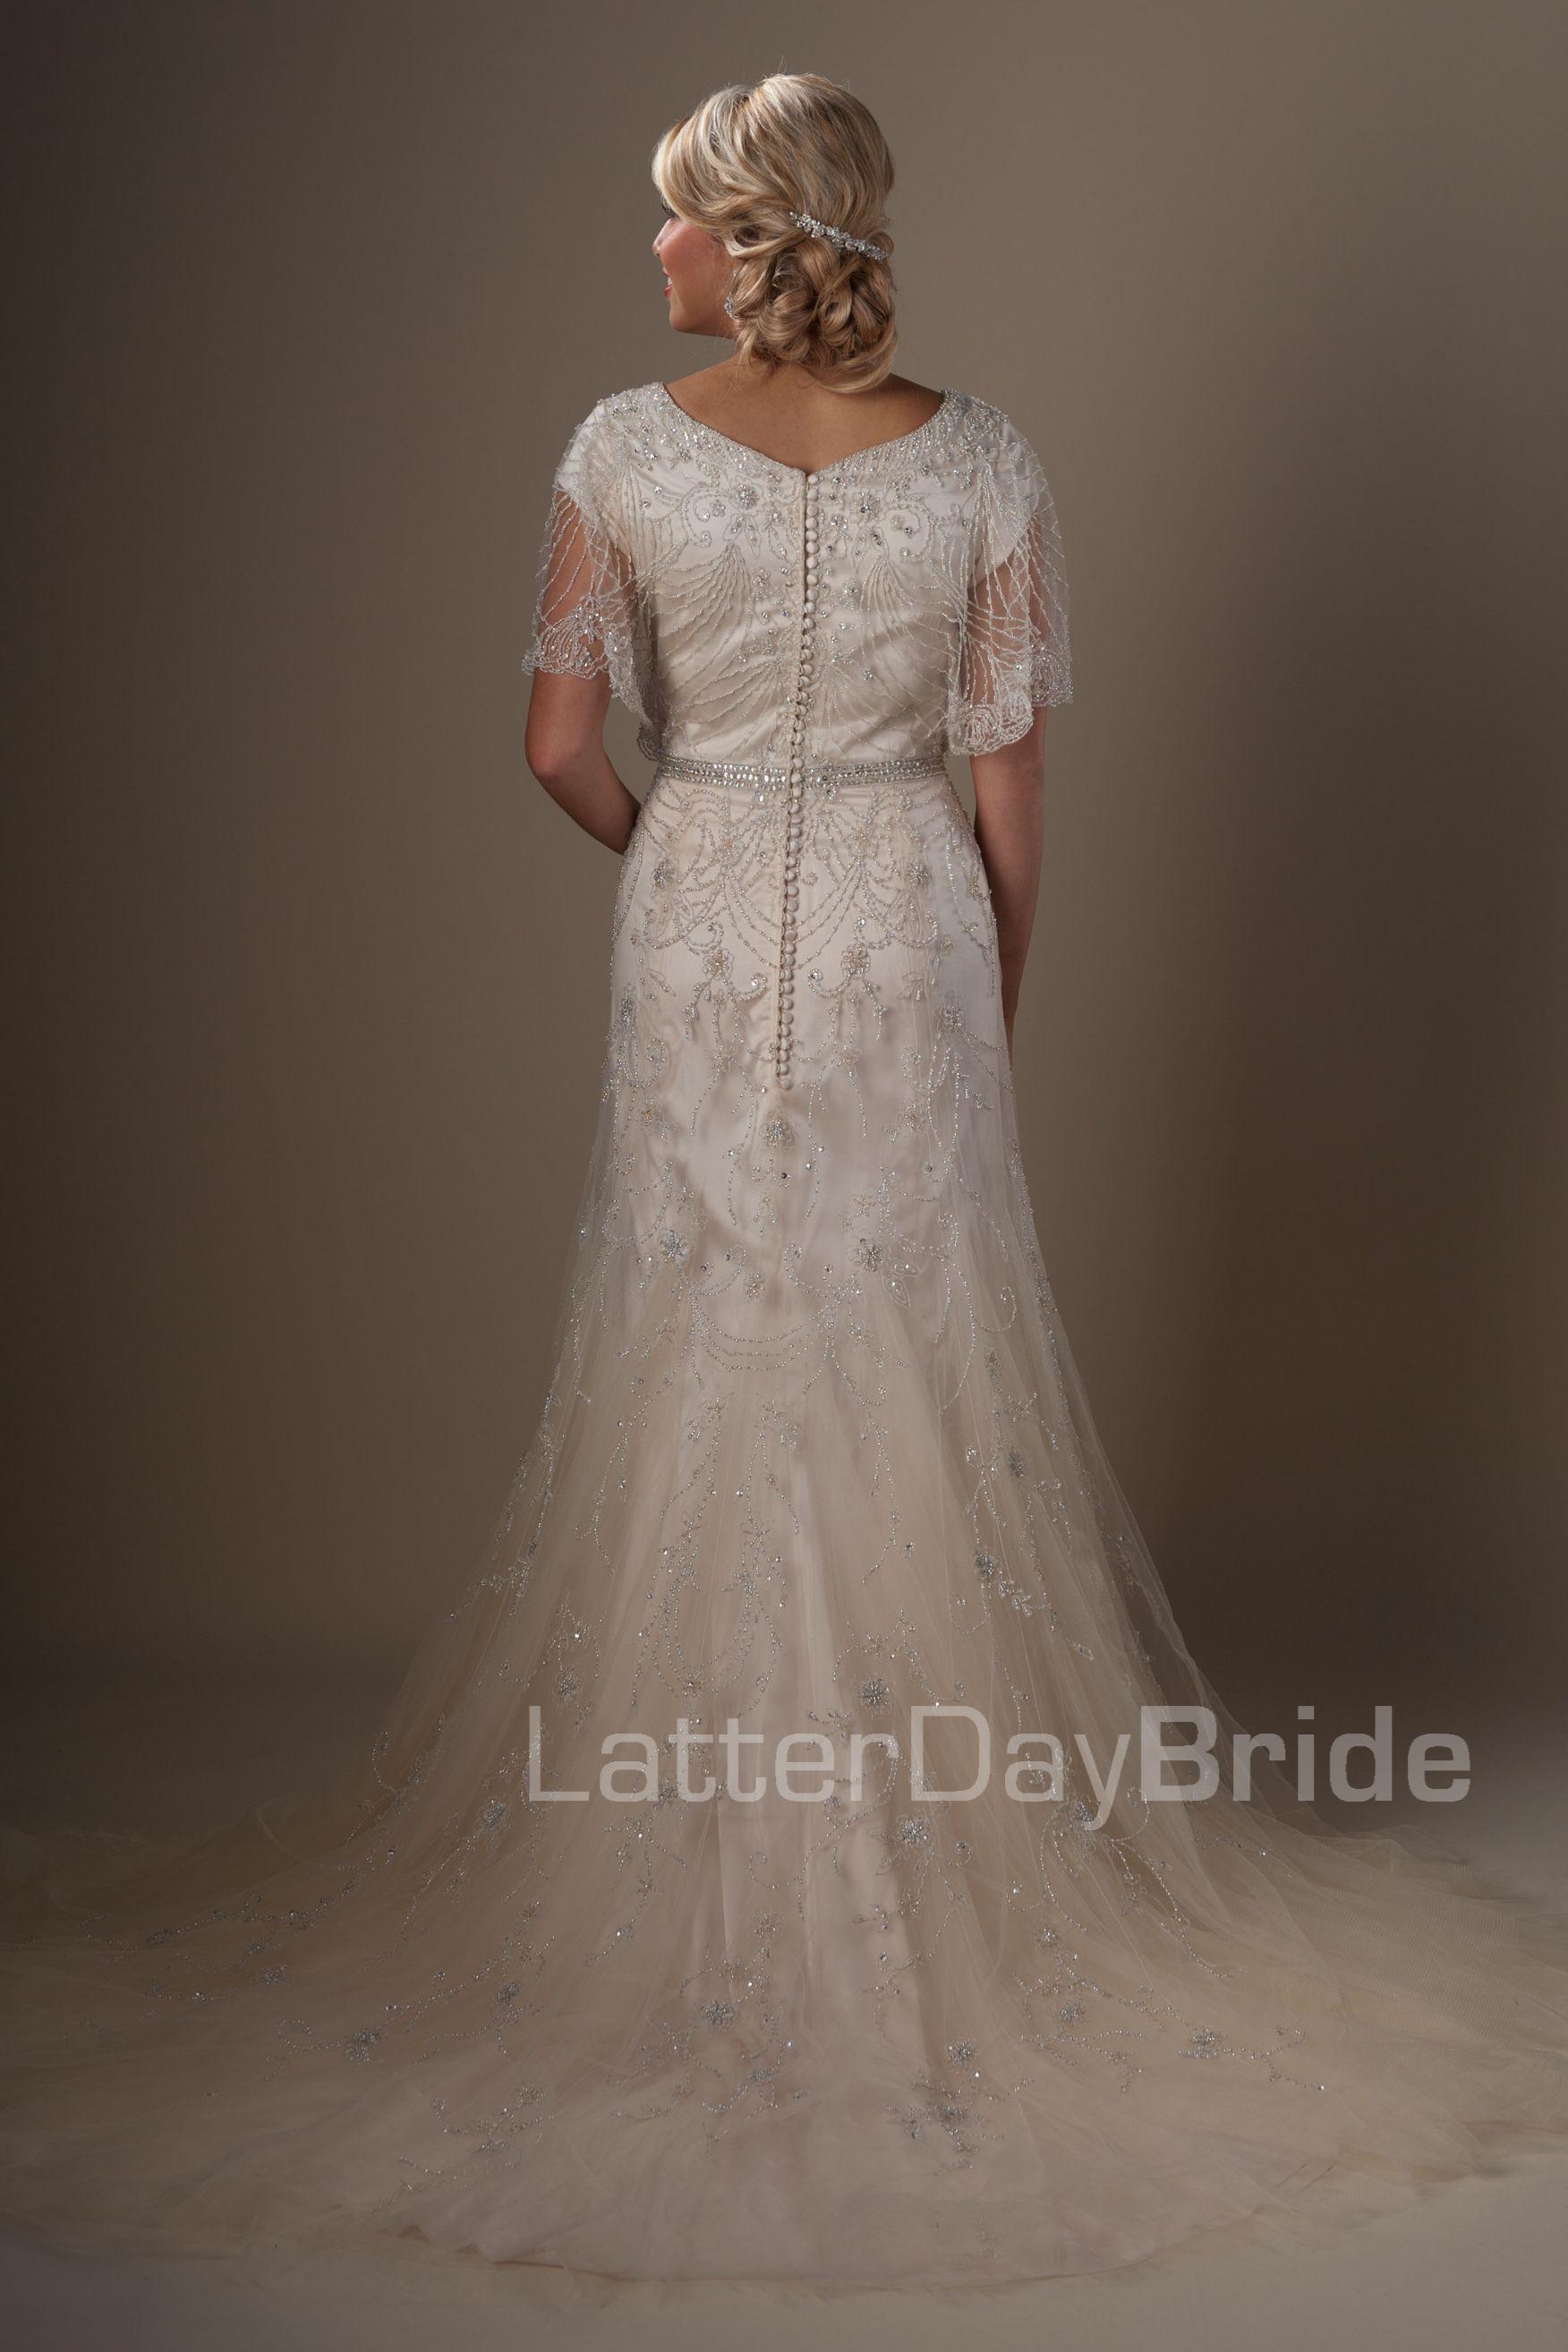 Modest Wedding Dresses : Penelope. Latter Day Bride, Gateway Bridal ...